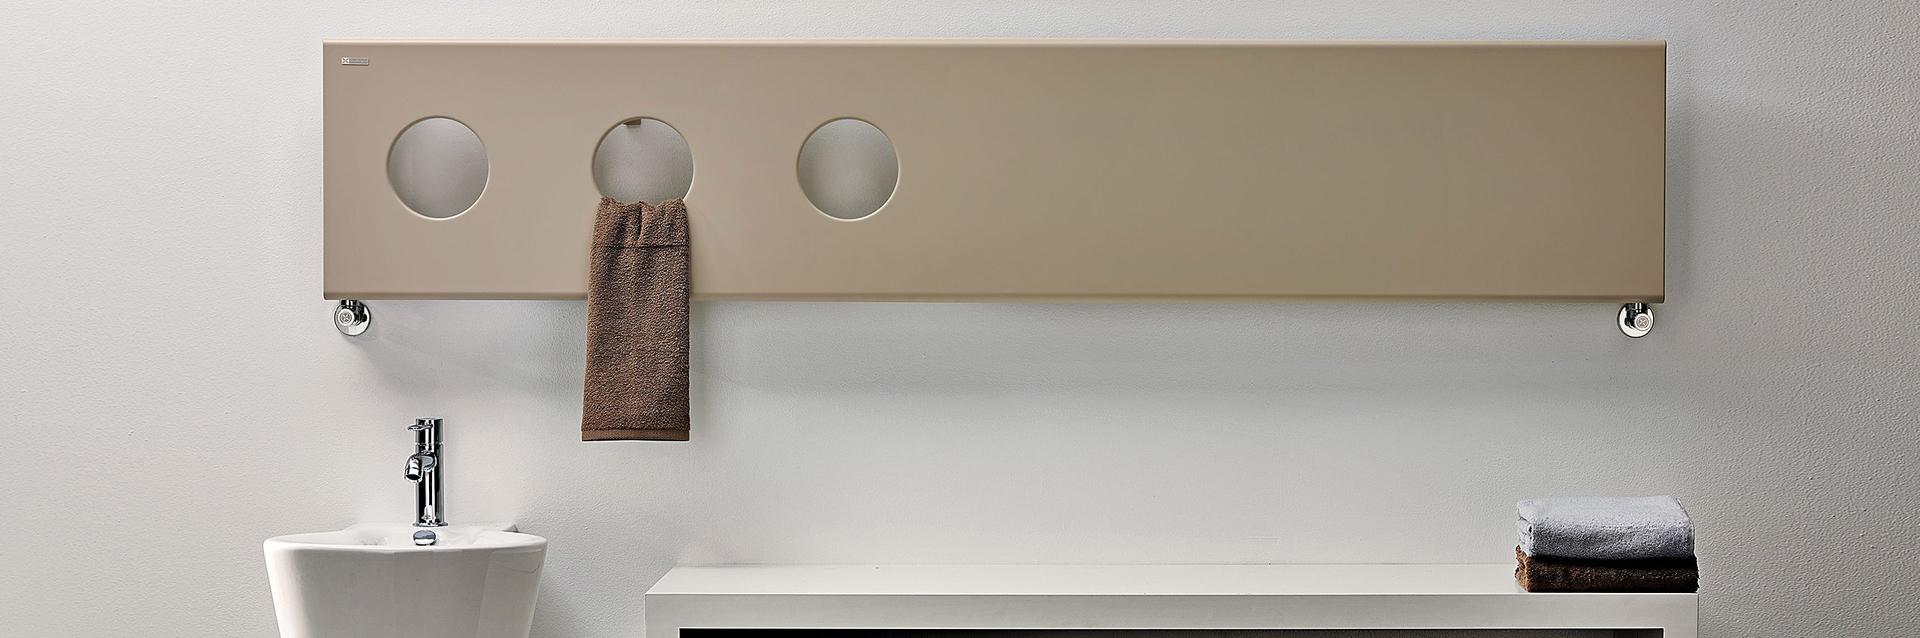 Instamat designradiator in bijzonder design - Instamat designradiator in bijzonder design